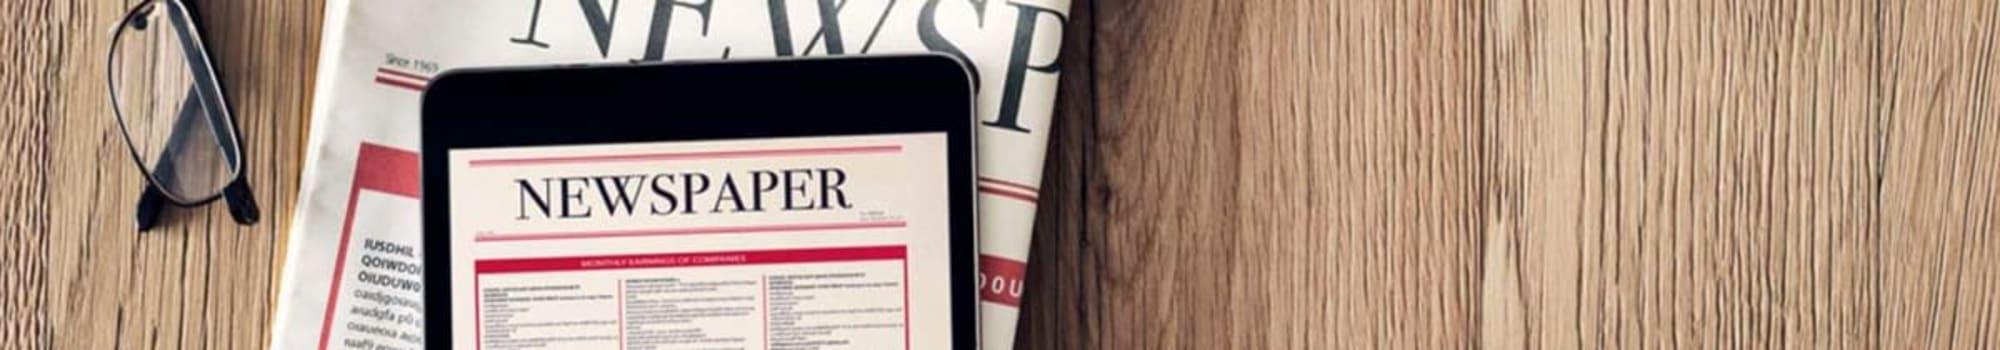 E-newsletter for Aspired Living of Prospect Heights in Prospect Heights, Illinois.